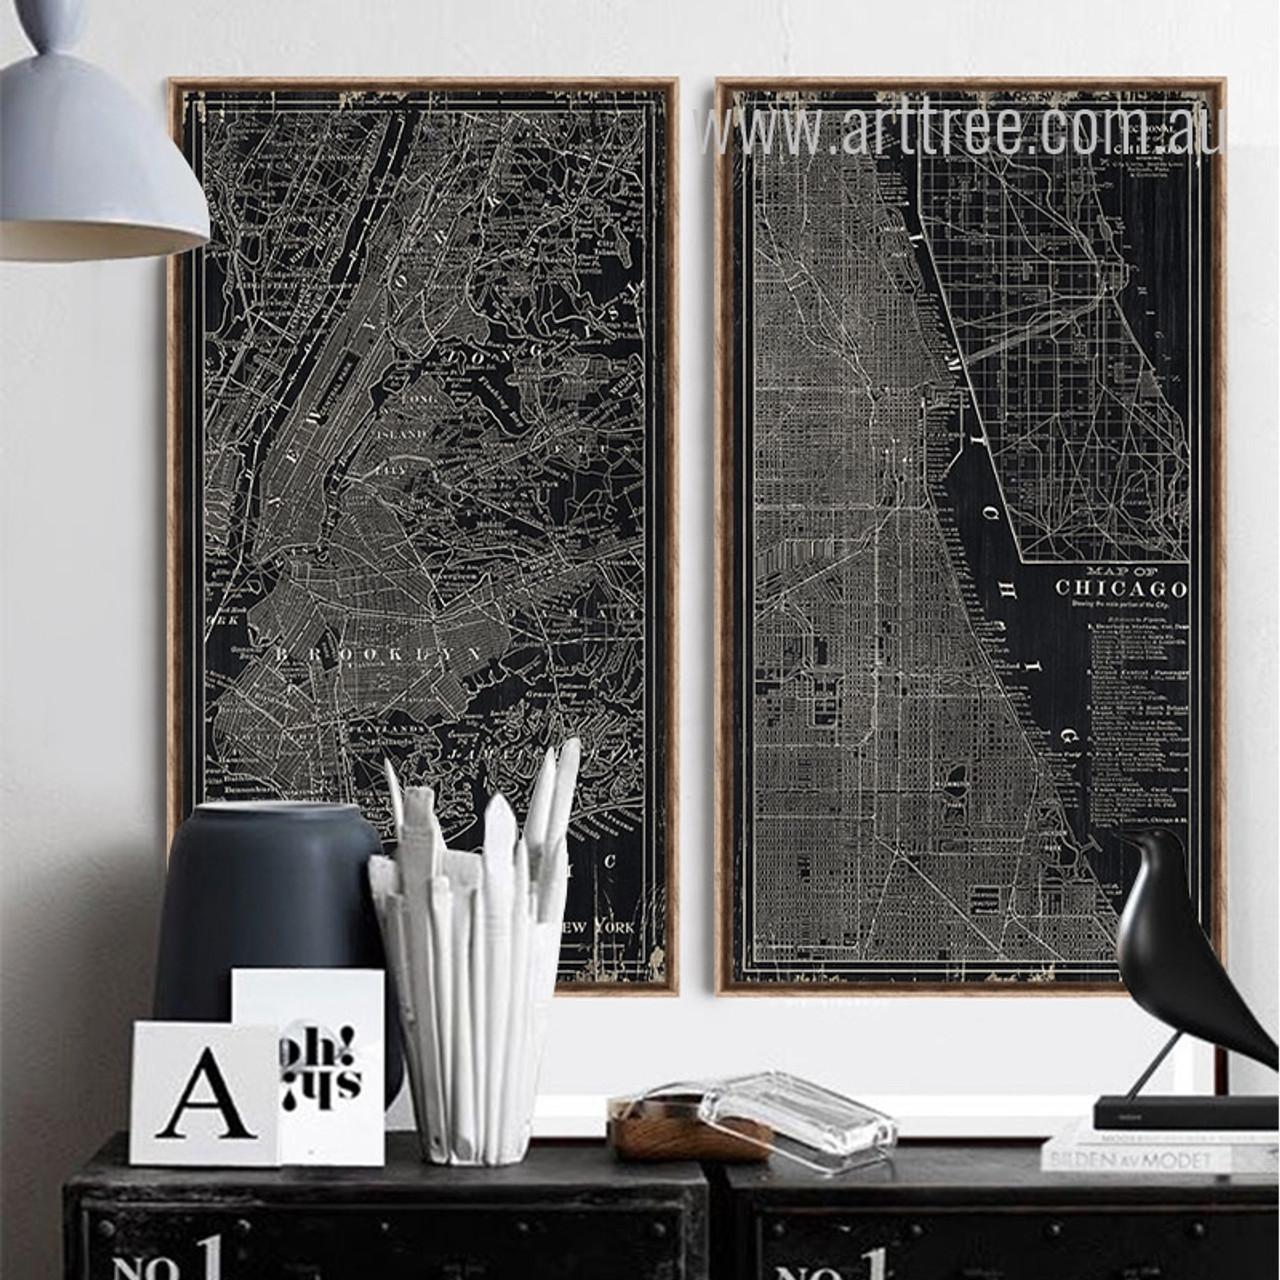 Chicago Map Canvas.New York Map Arttree